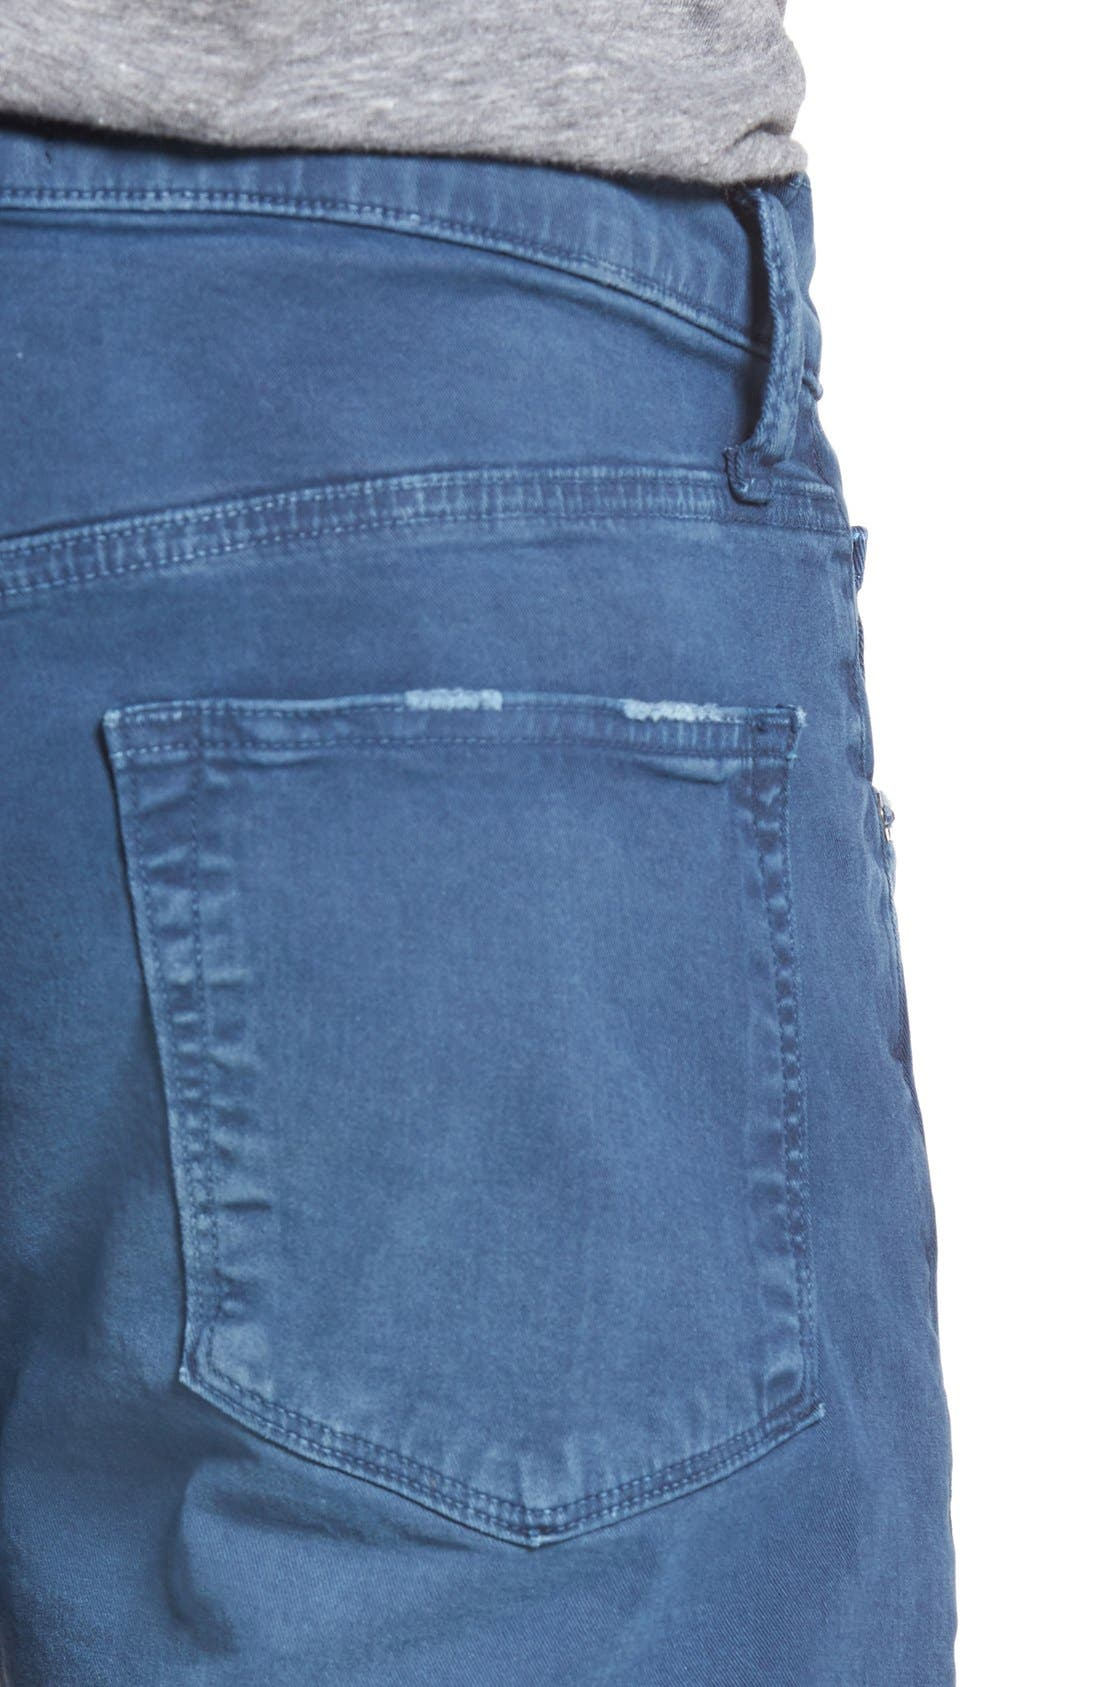 Tyler Slim Fit Jeans,                             Alternate thumbnail 17, color,